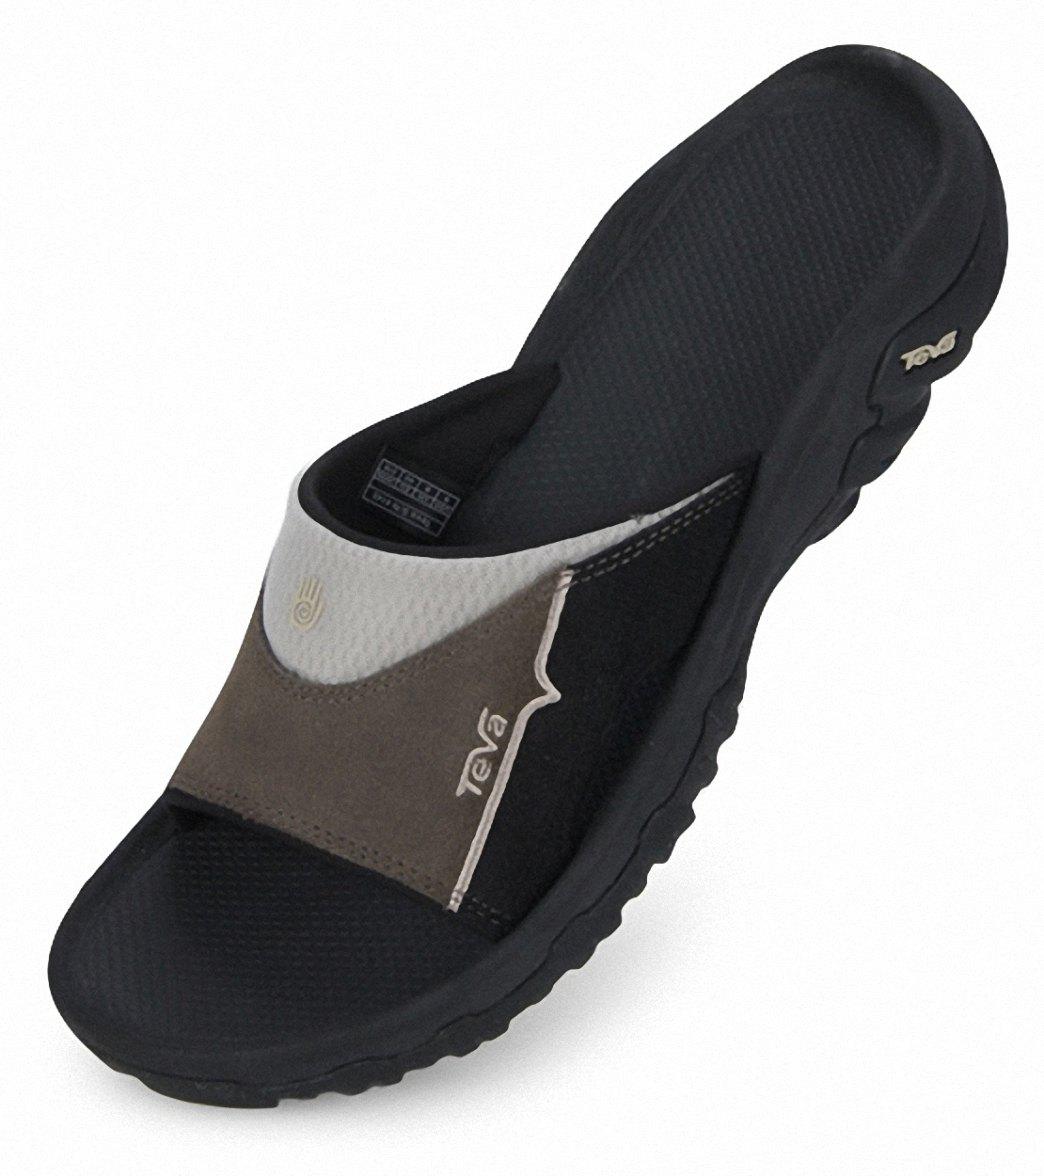 a3a6d1af7e52 Teva Men s Katavi Slide Sandals at SwimOutlet.com - Free Shipping